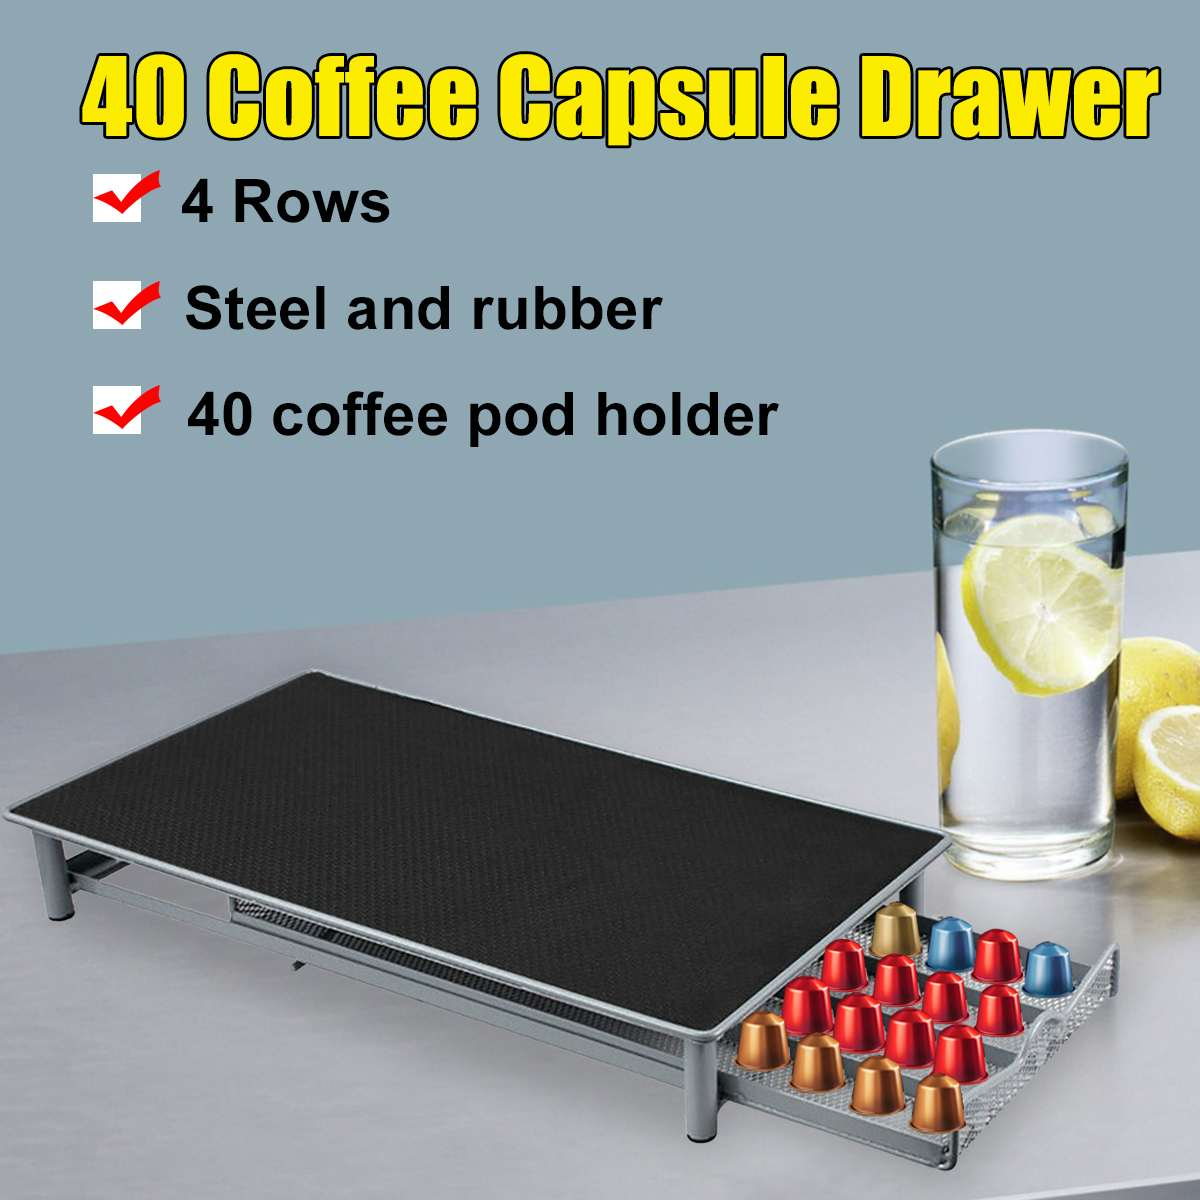 40 cápsulas para Cápsula de café Nespresso soporte de almacenamiento cajón de Metal organizador estante de almacenamiento cajones cápsulas de café